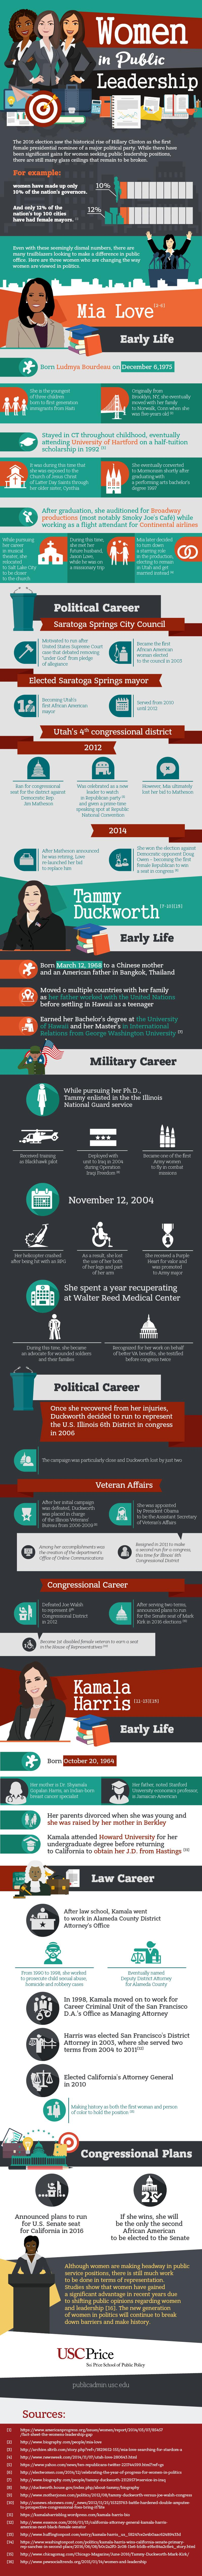 Women in Public Leadership Infographic